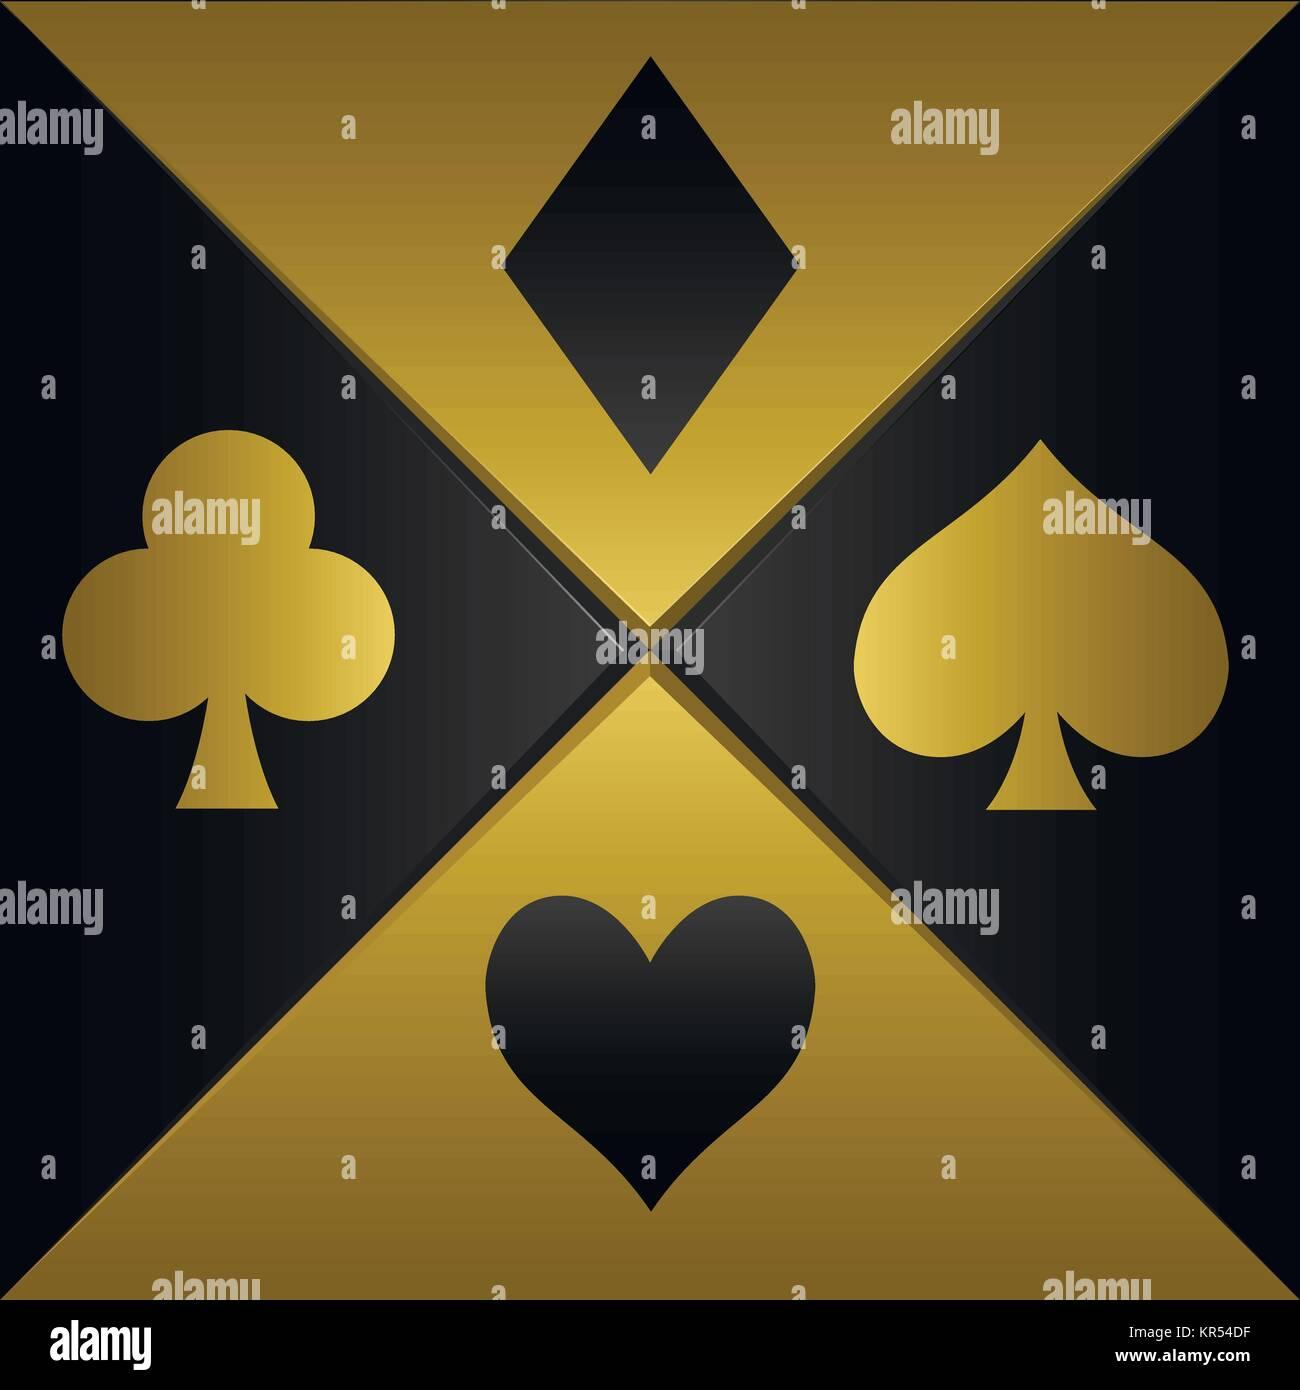 Poker playing card symbols stock vector art illustration vector poker playing card symbols biocorpaavc